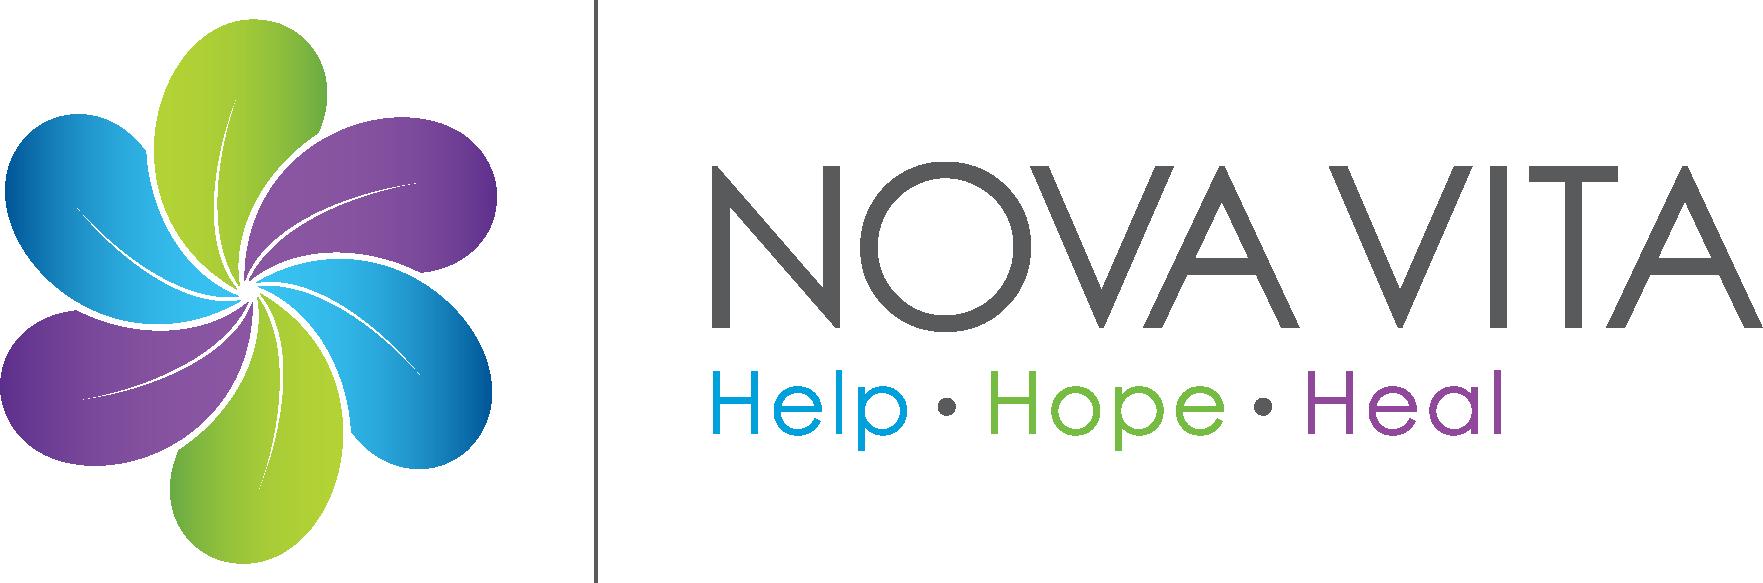 Nova Vita Domestic Violence Prevention Services